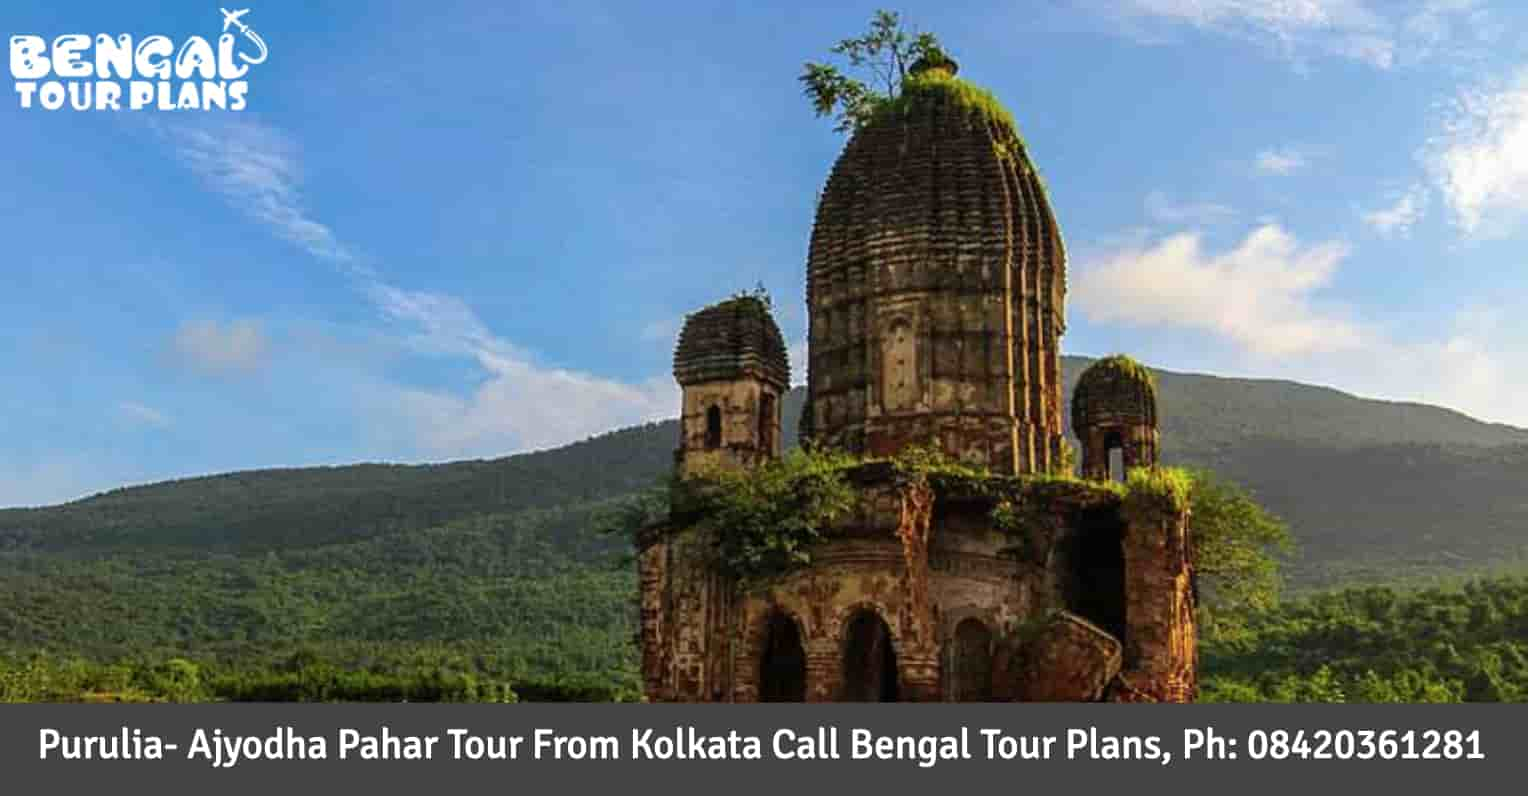 Purulia Ajyodha Pahar Tour Package From Kolkata